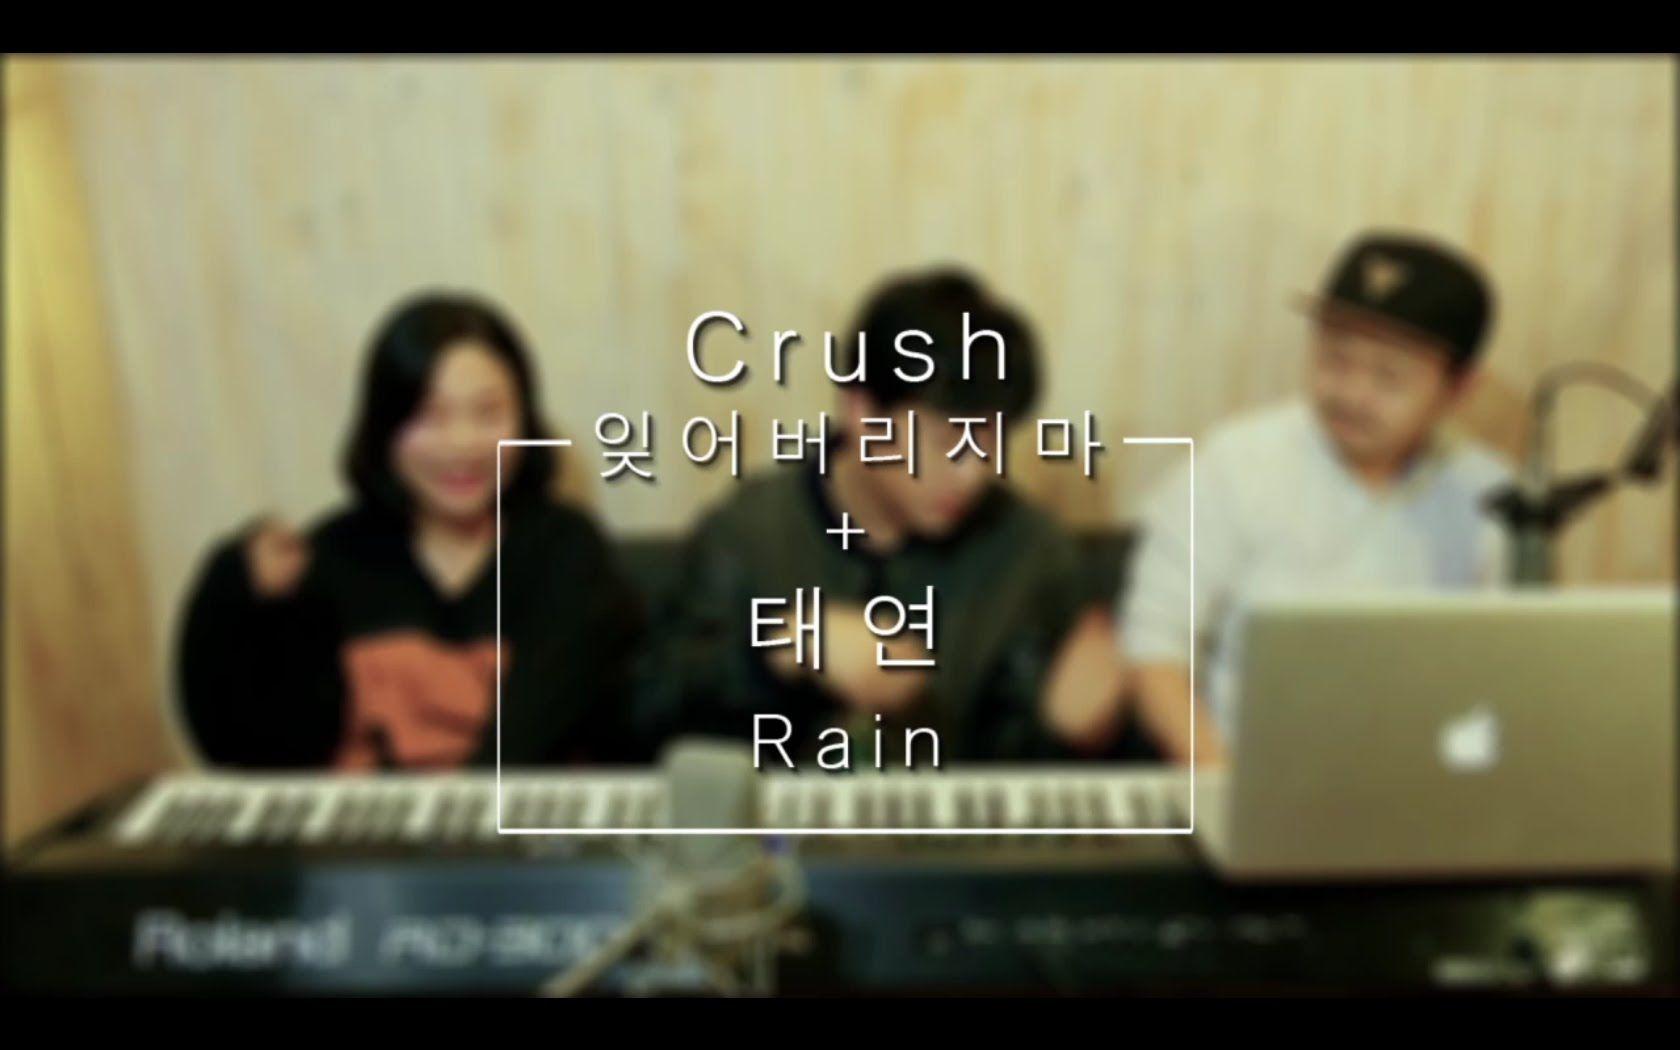 [Cover] 잊어버리지마(Crush) + Rain(태연)